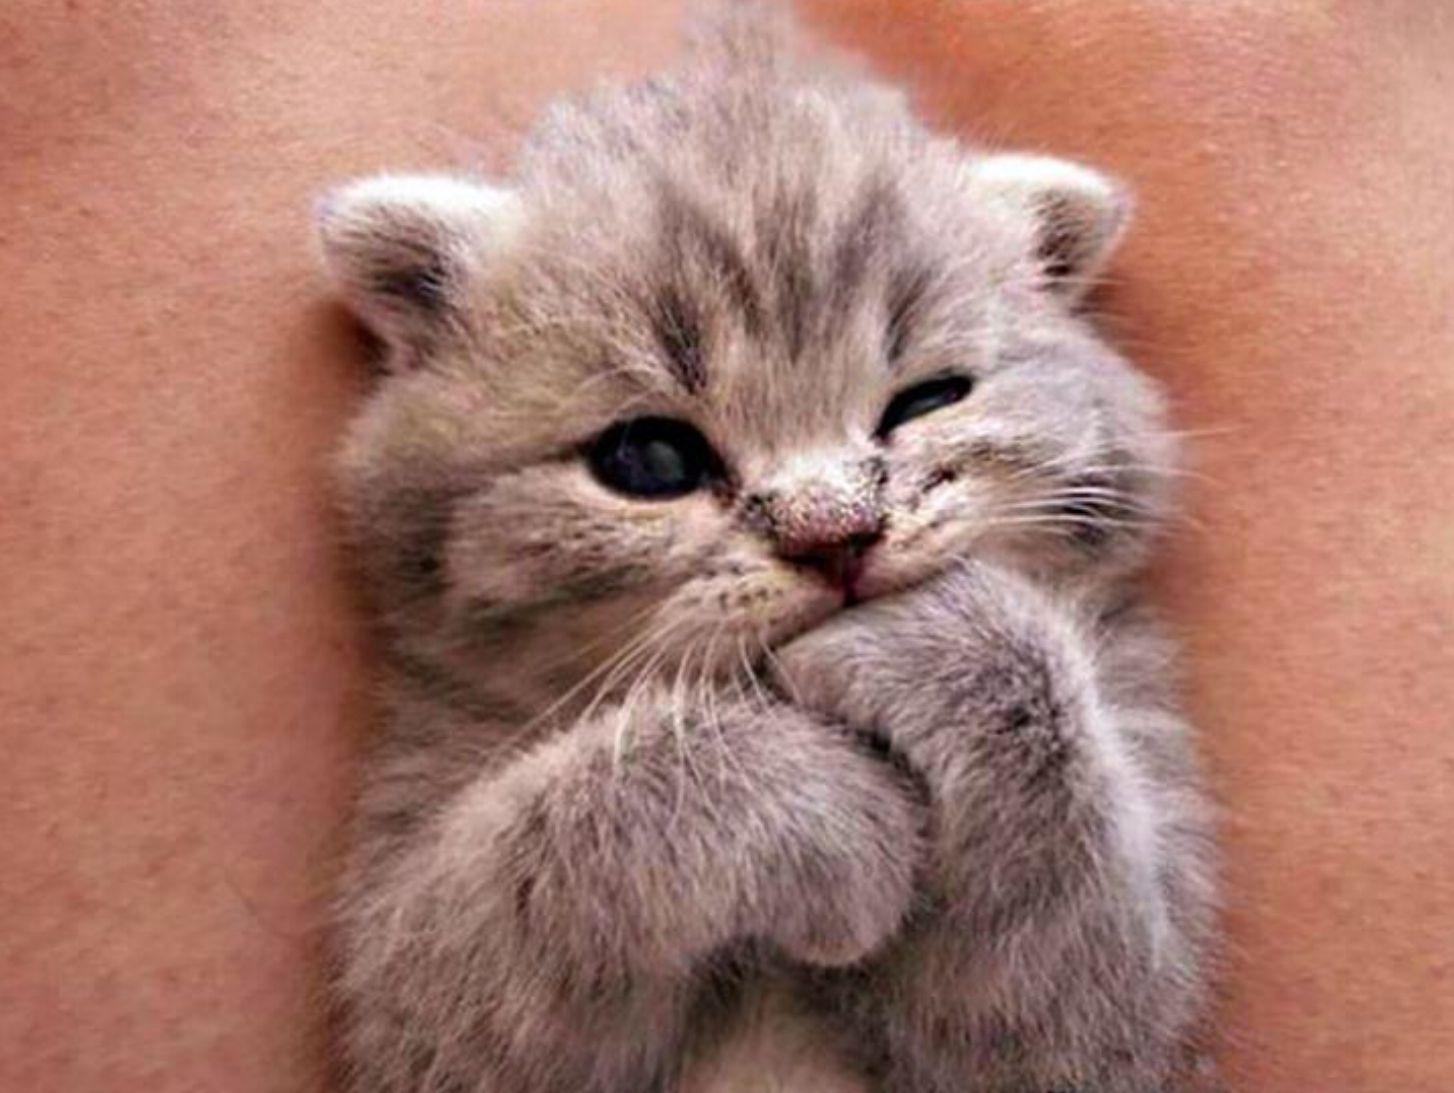 Pin By Katie Nguyen On My Name Is Give Me Aa Hoiyaaaaaaaaaa Cutest Kittens Ever Kittens Cutest Kitten Pictures